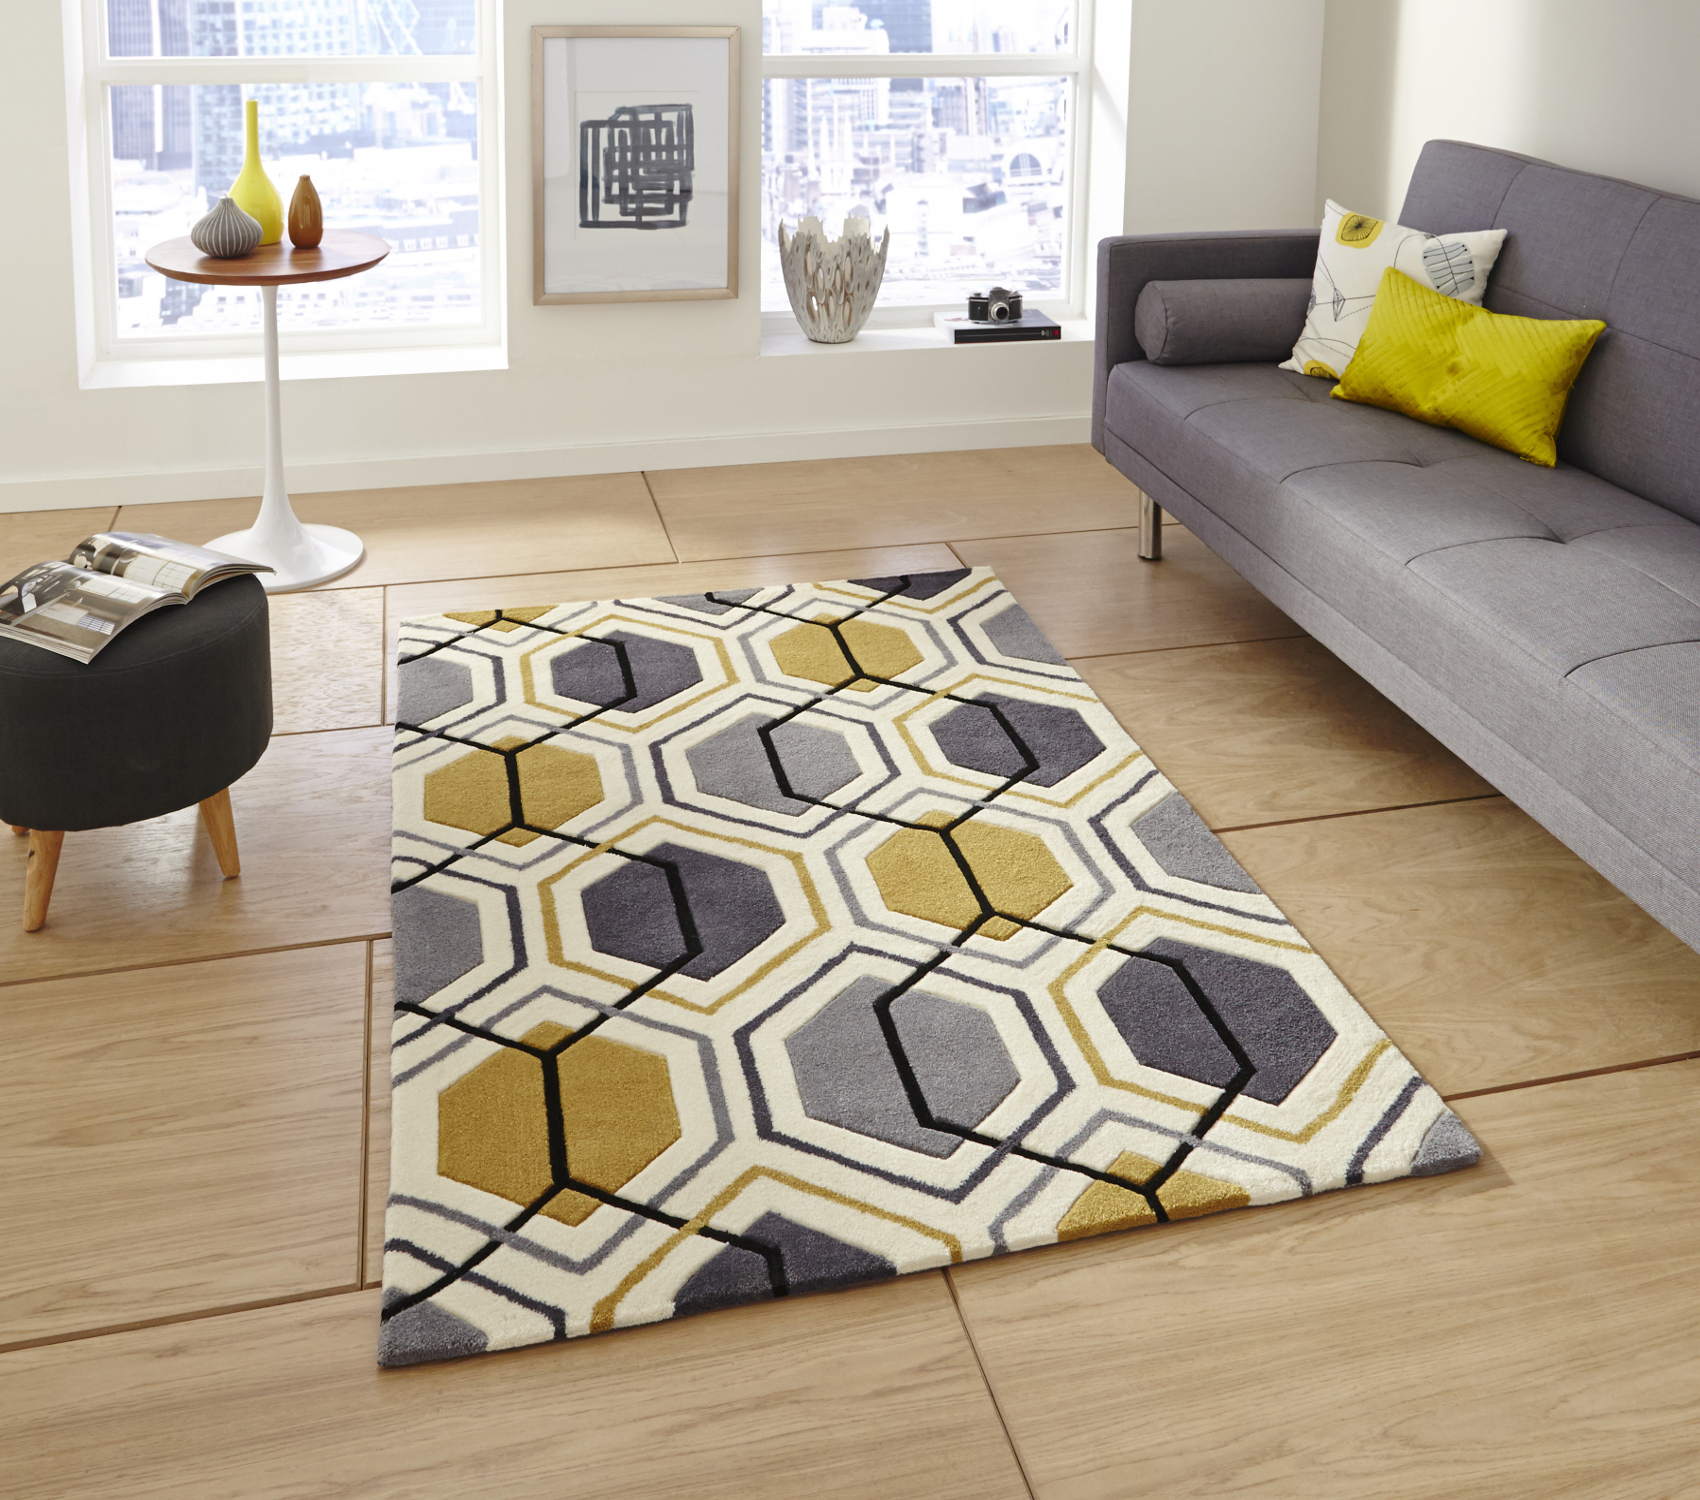 Http Www Ebay Co Uk Itm Hong Kong Hexagon Rug 100 Acrylic Hand Tufted Large Geometric Home Decor Mat 311406282830